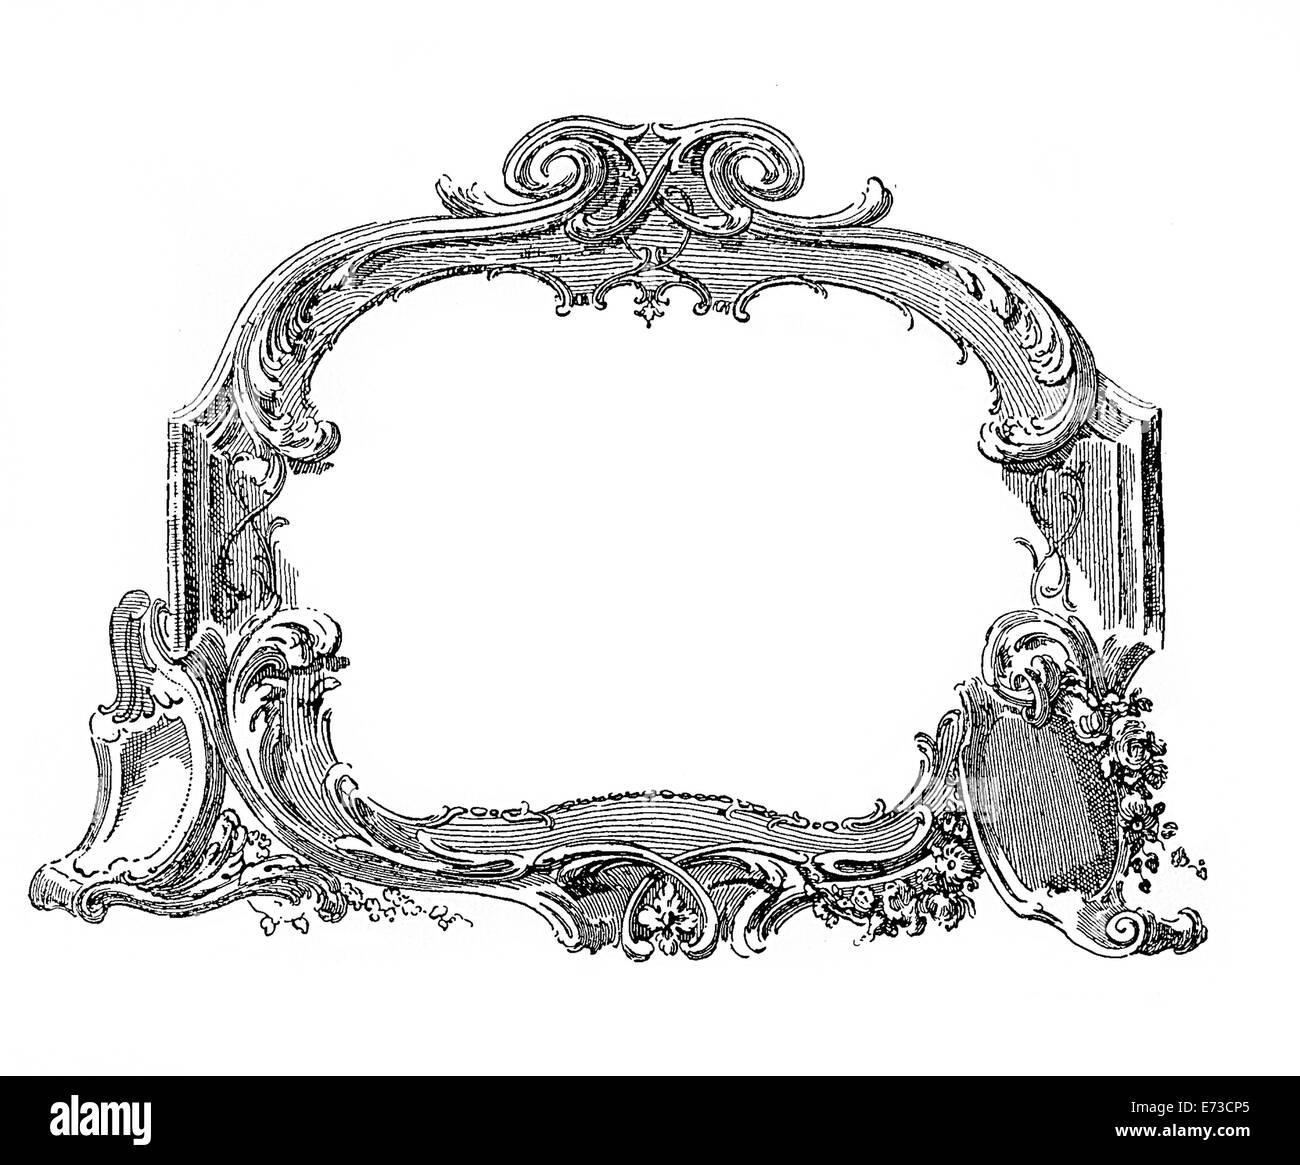 Renaissance Ornamentrahmen mit floralen Elementen Stockfoto, Bild ...